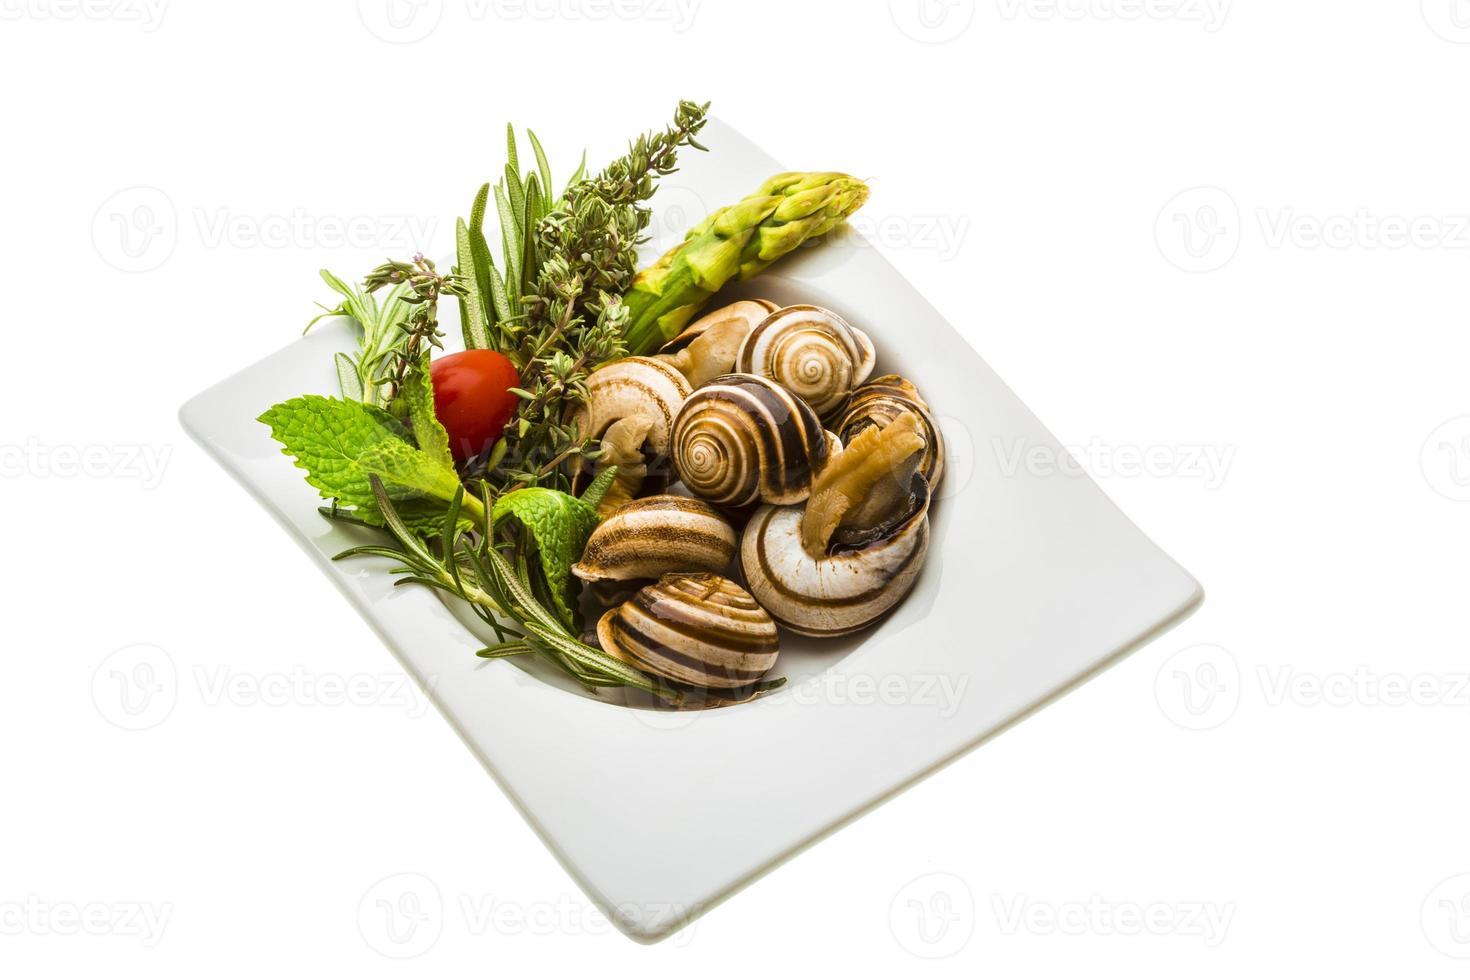 escargot aux asperges, romarin, thymus et tomate photo